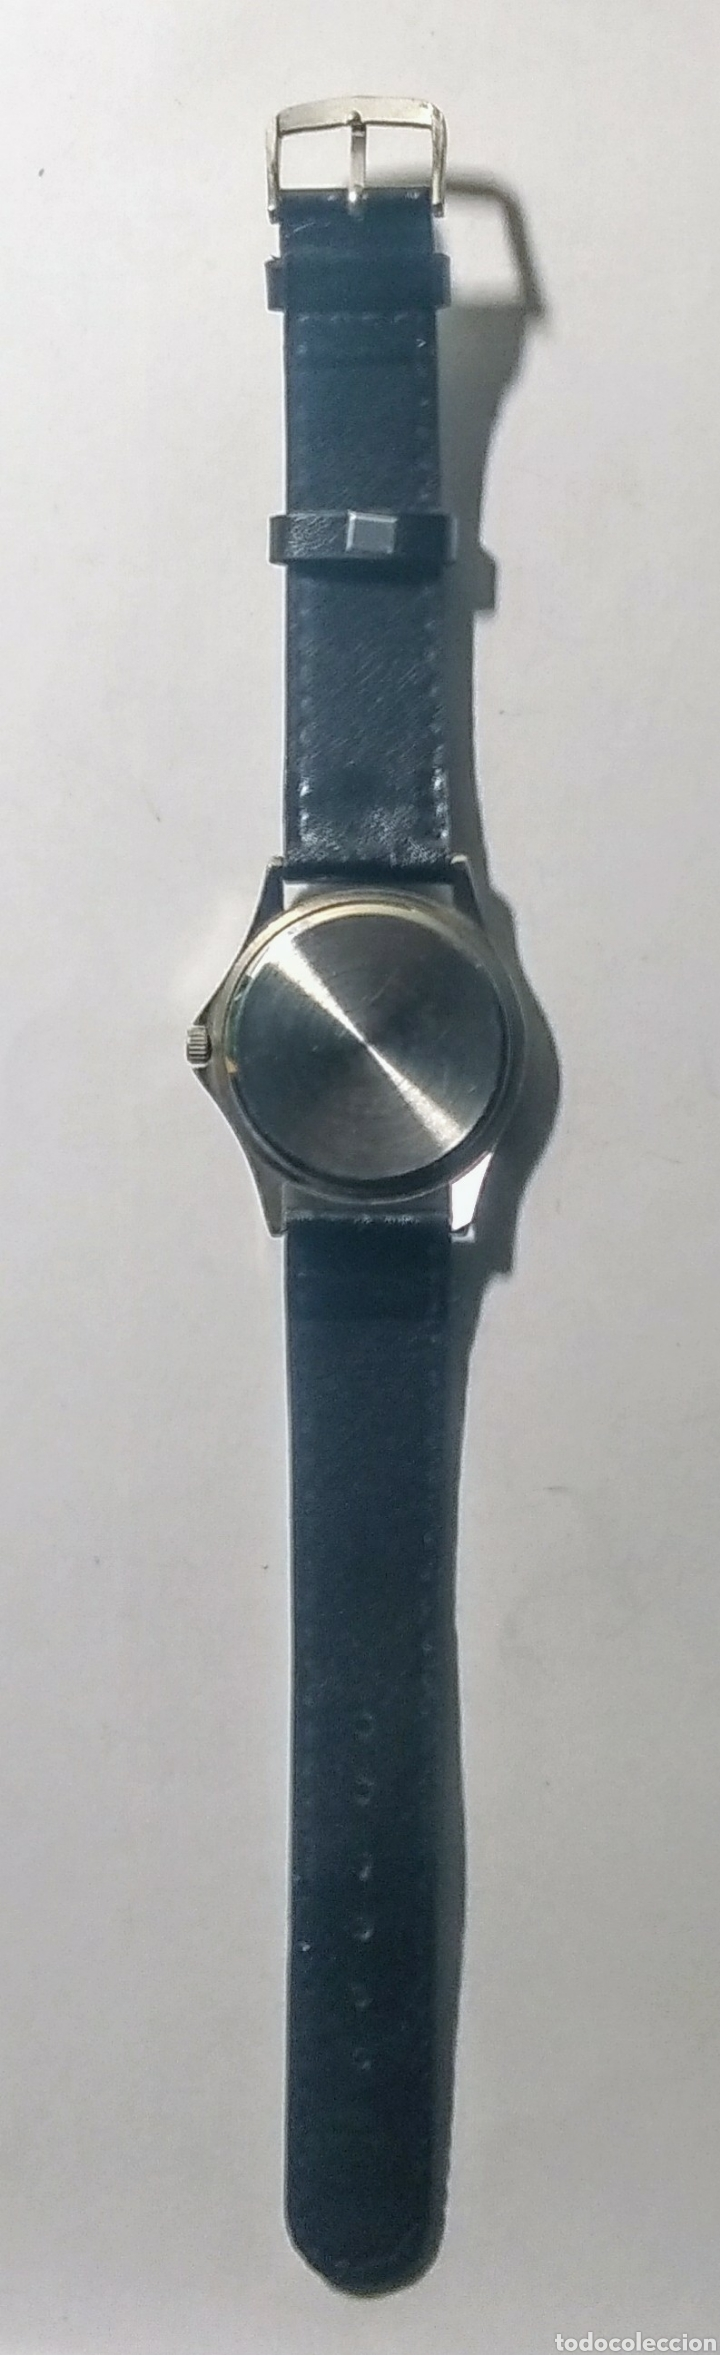 Relojes: Reloj de pulsera. Marca Danone. 1996 - Foto 3 - 186243338